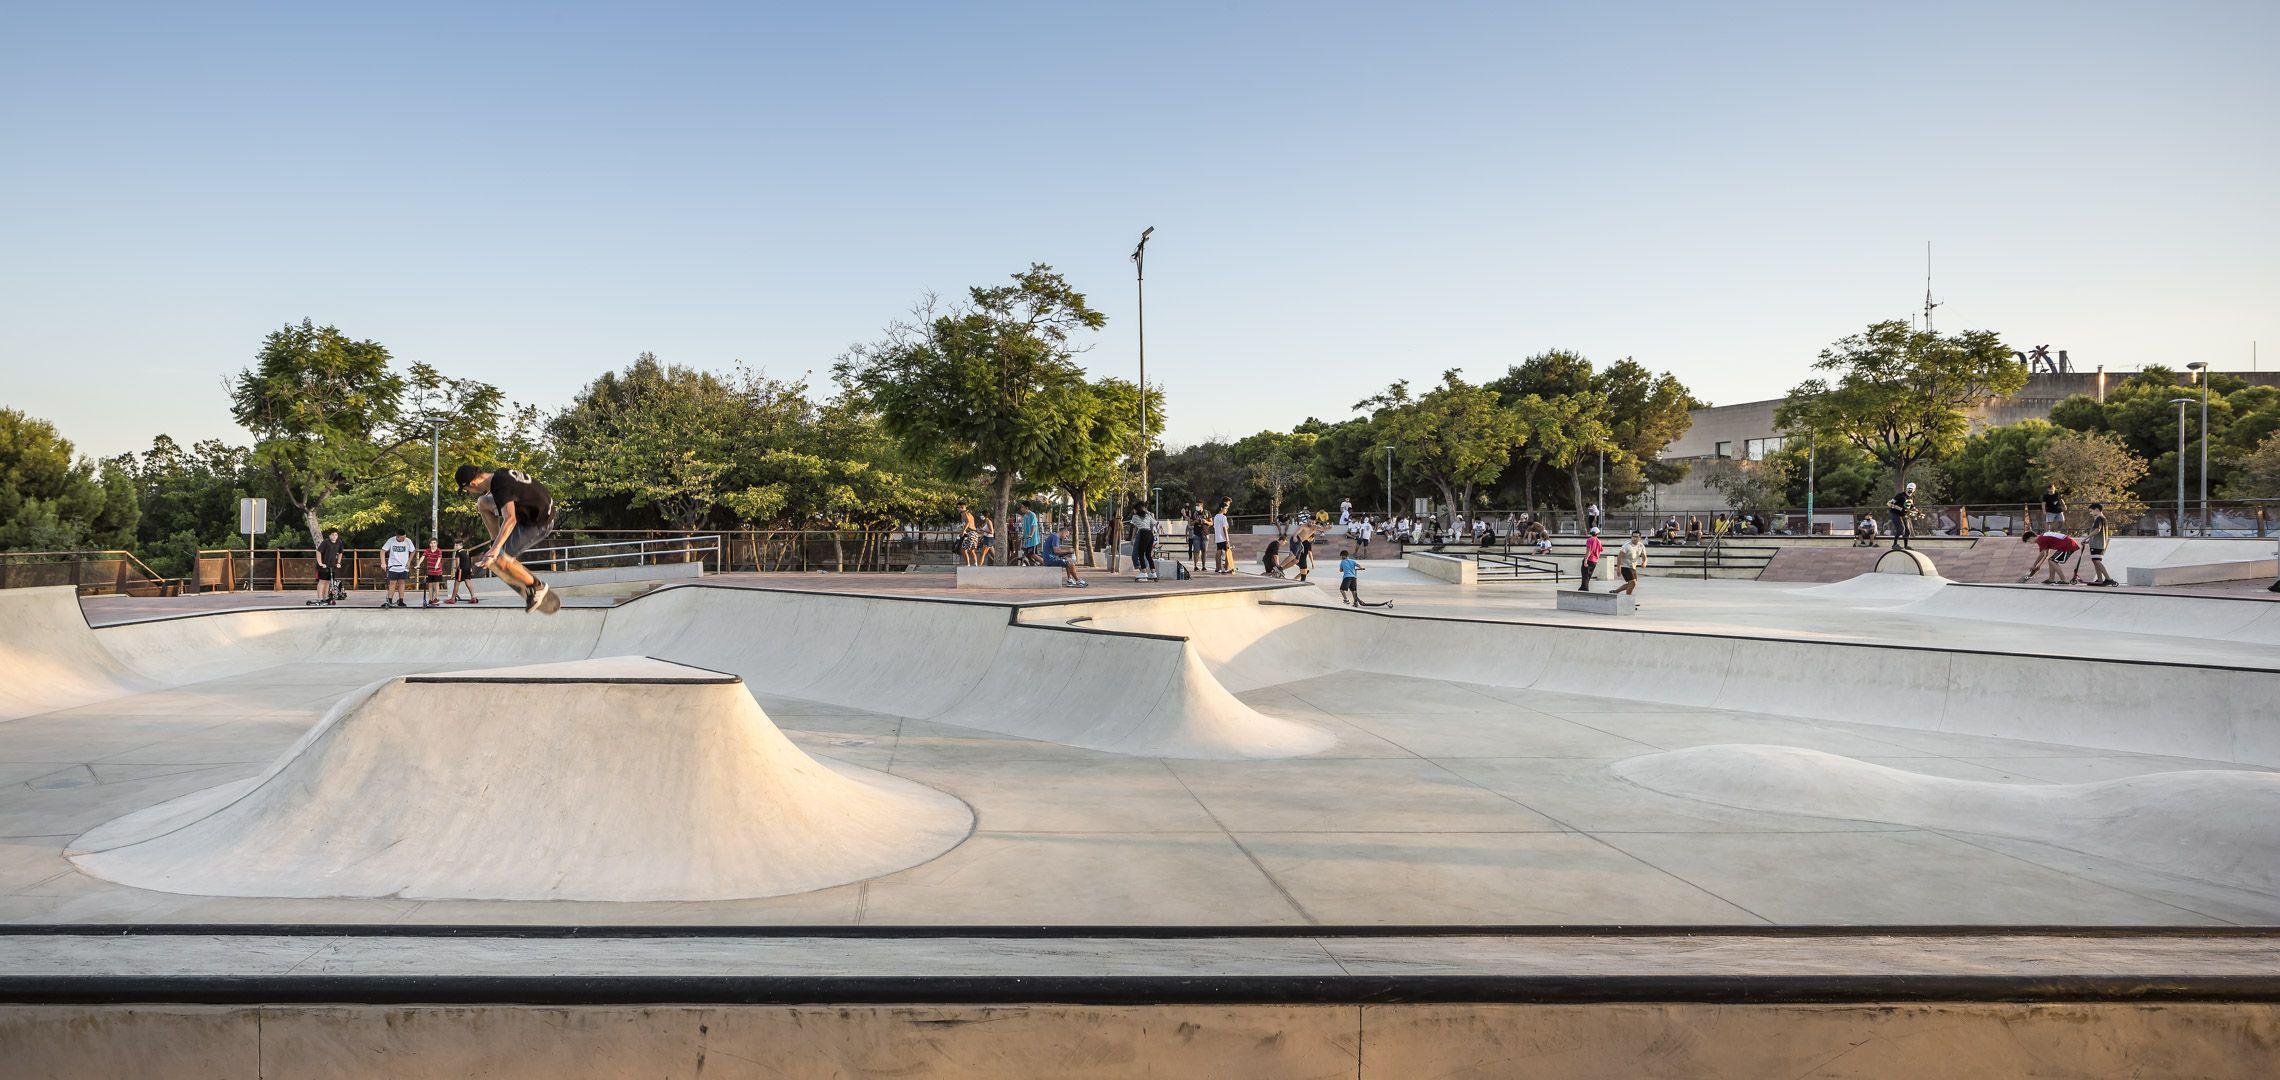 Skatepark, losa, llosa, pavimento, adoquín, adoquines